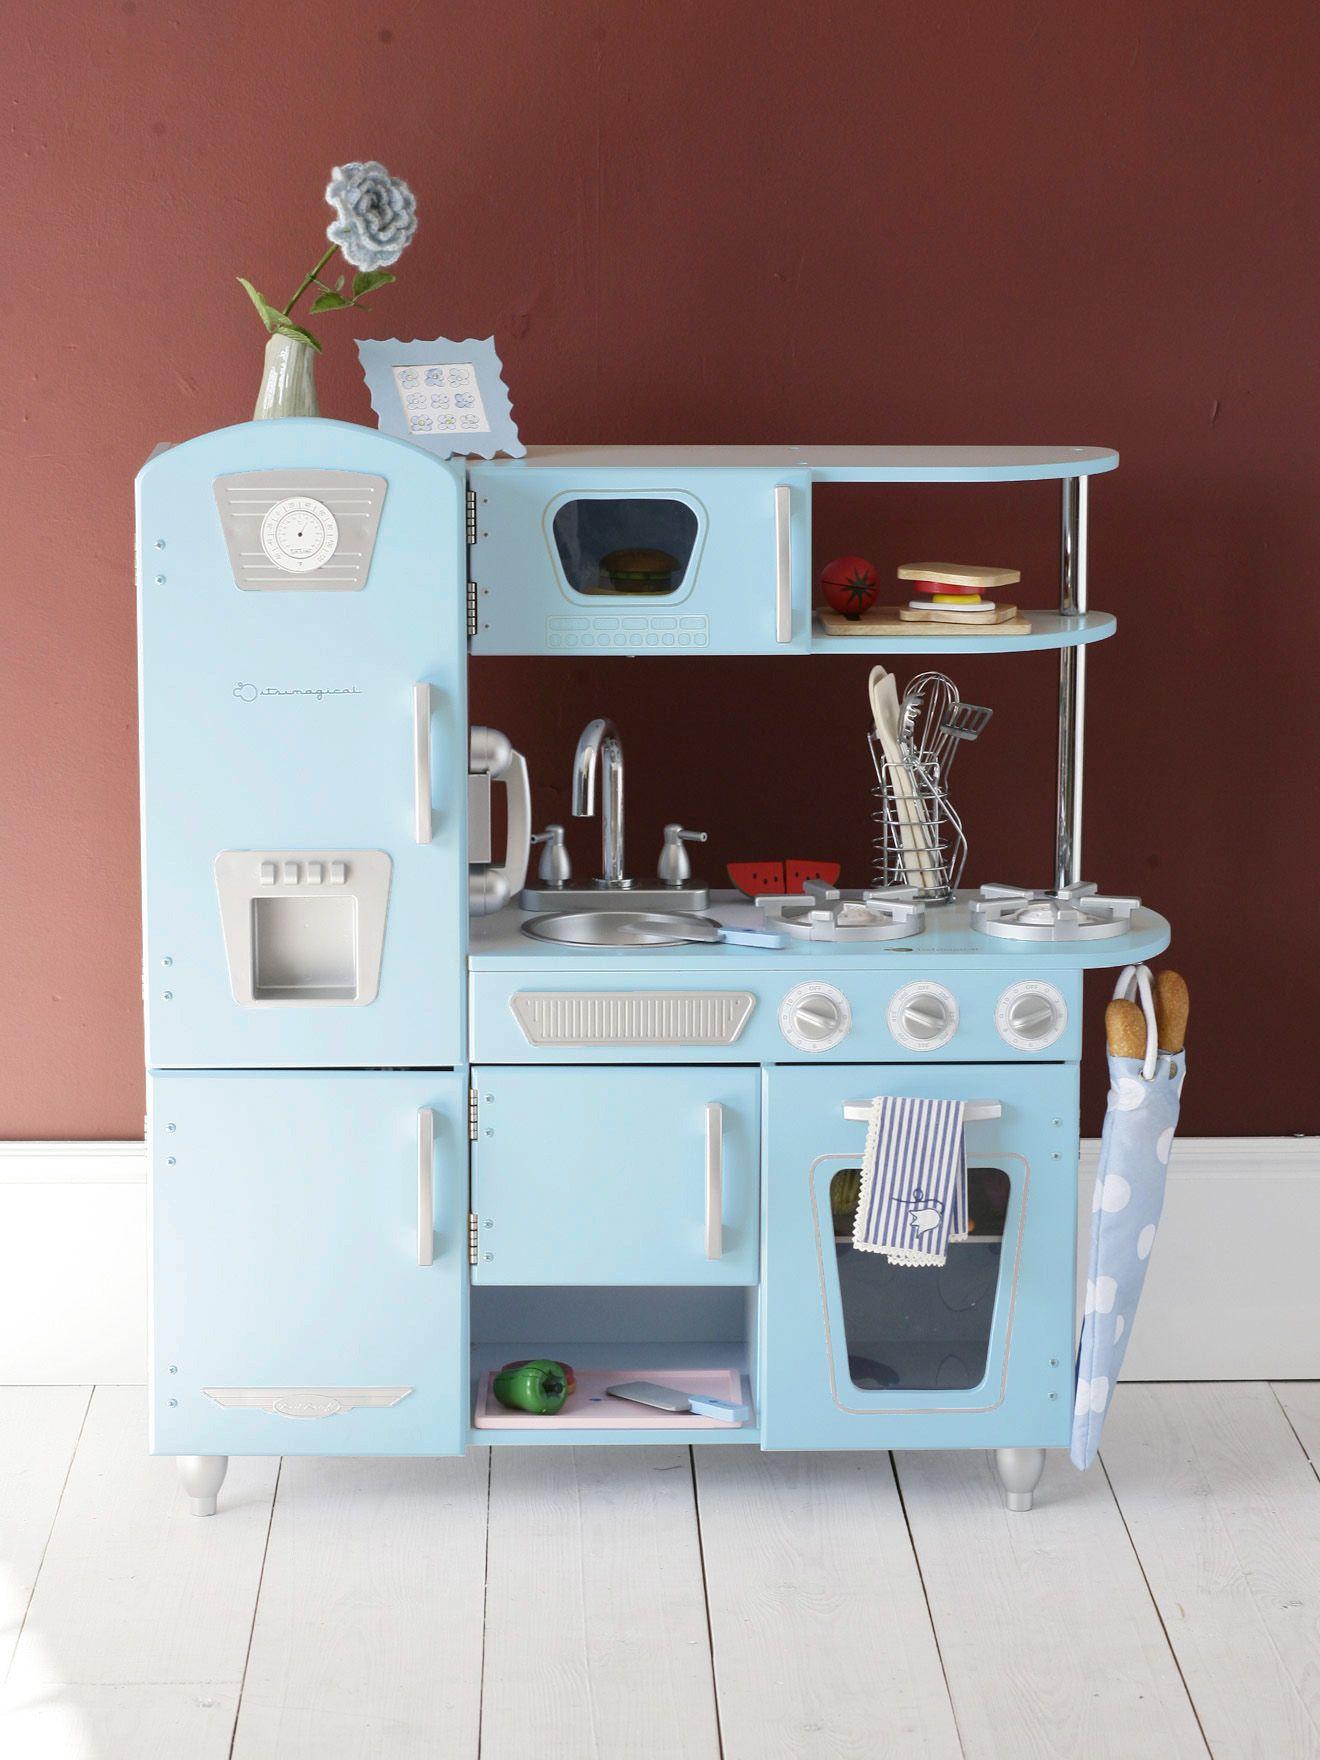 cuisine en bois imaginarium vertbaudet baby love. Black Bedroom Furniture Sets. Home Design Ideas